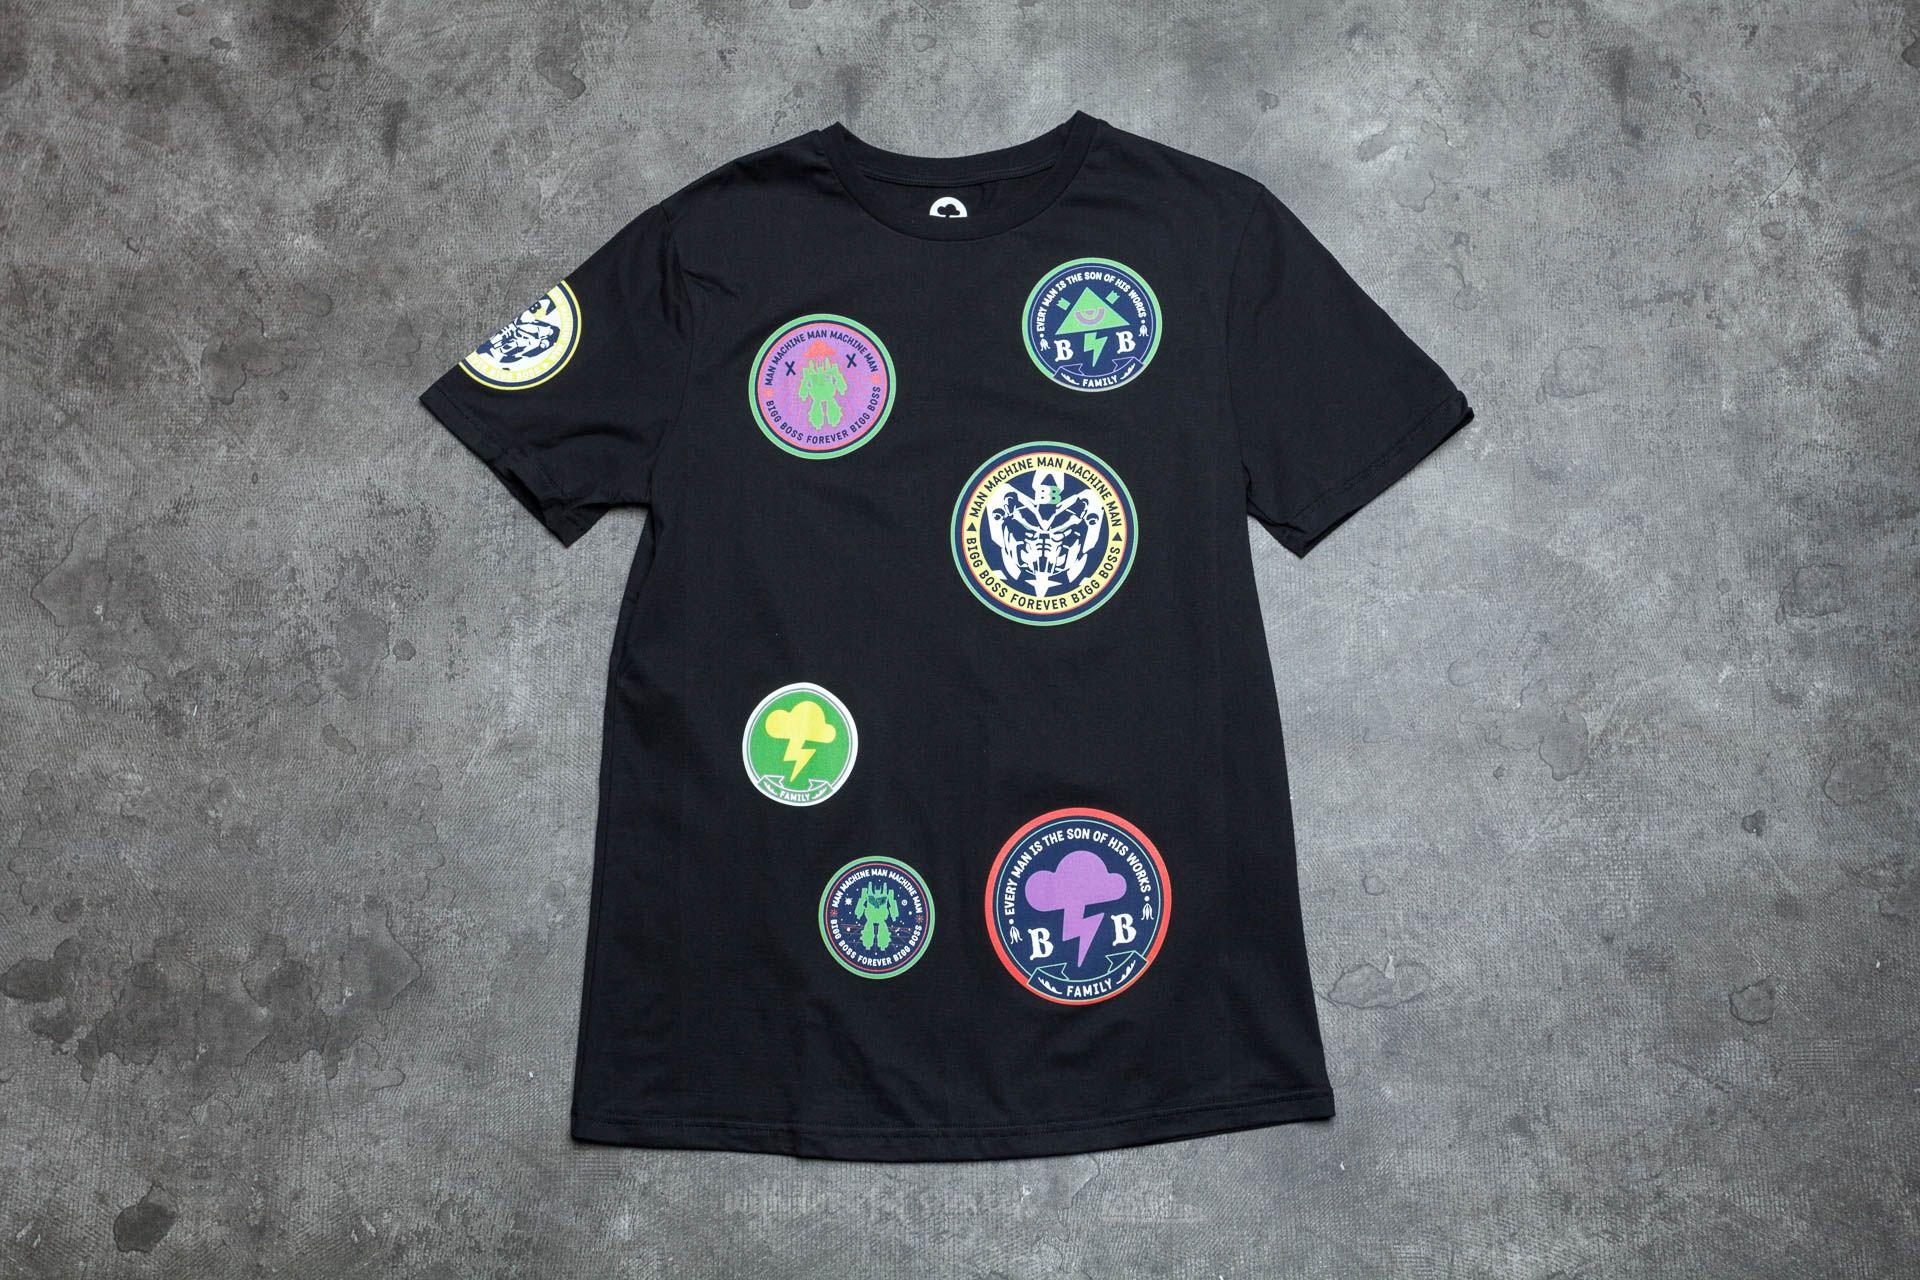 BIGG BOSS Stamps T-Shirt Black